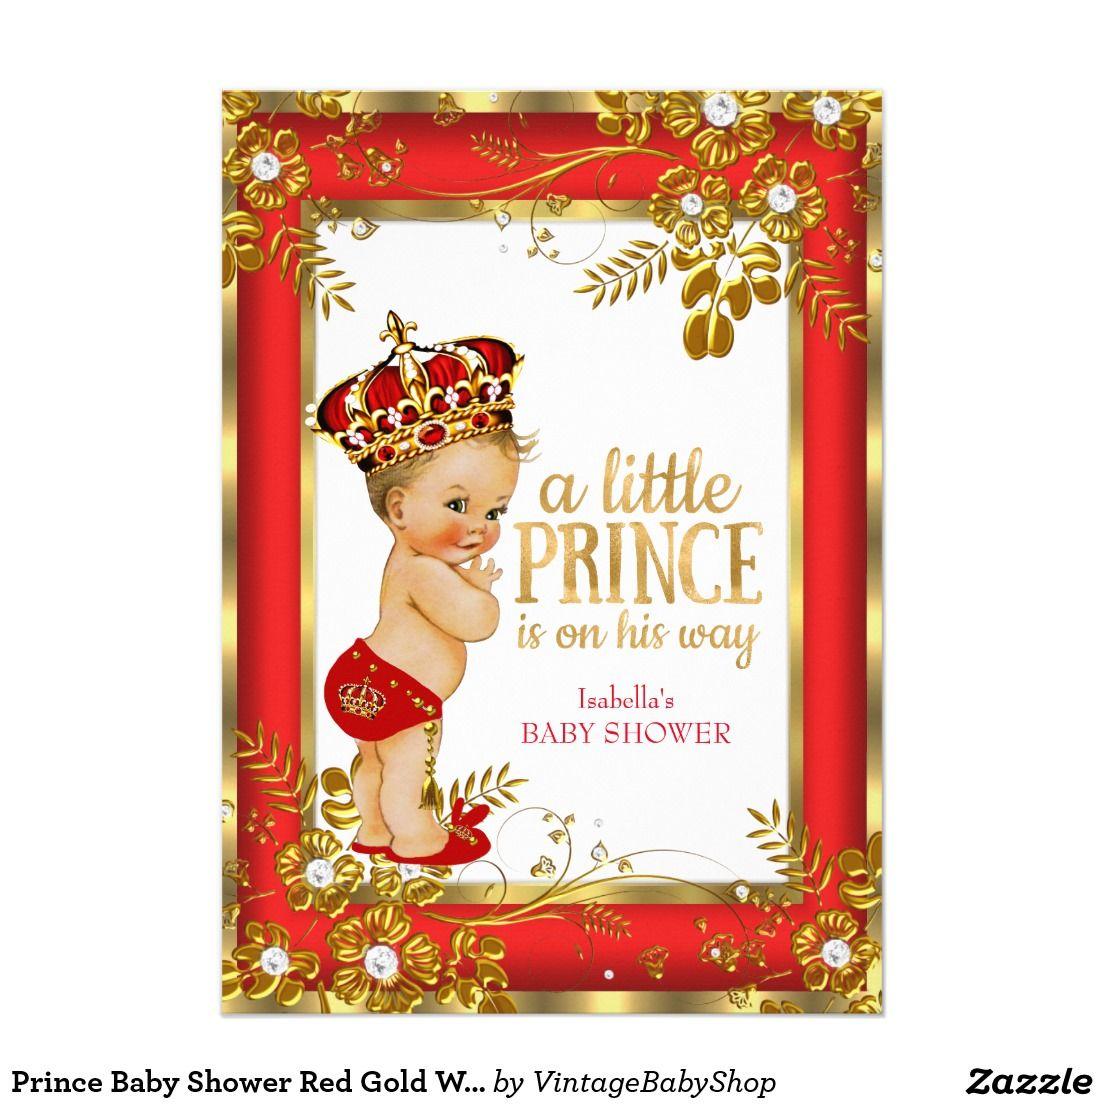 Prince Baby Shower Red Gold White Blonde Boy Invitation | Pinterest ...